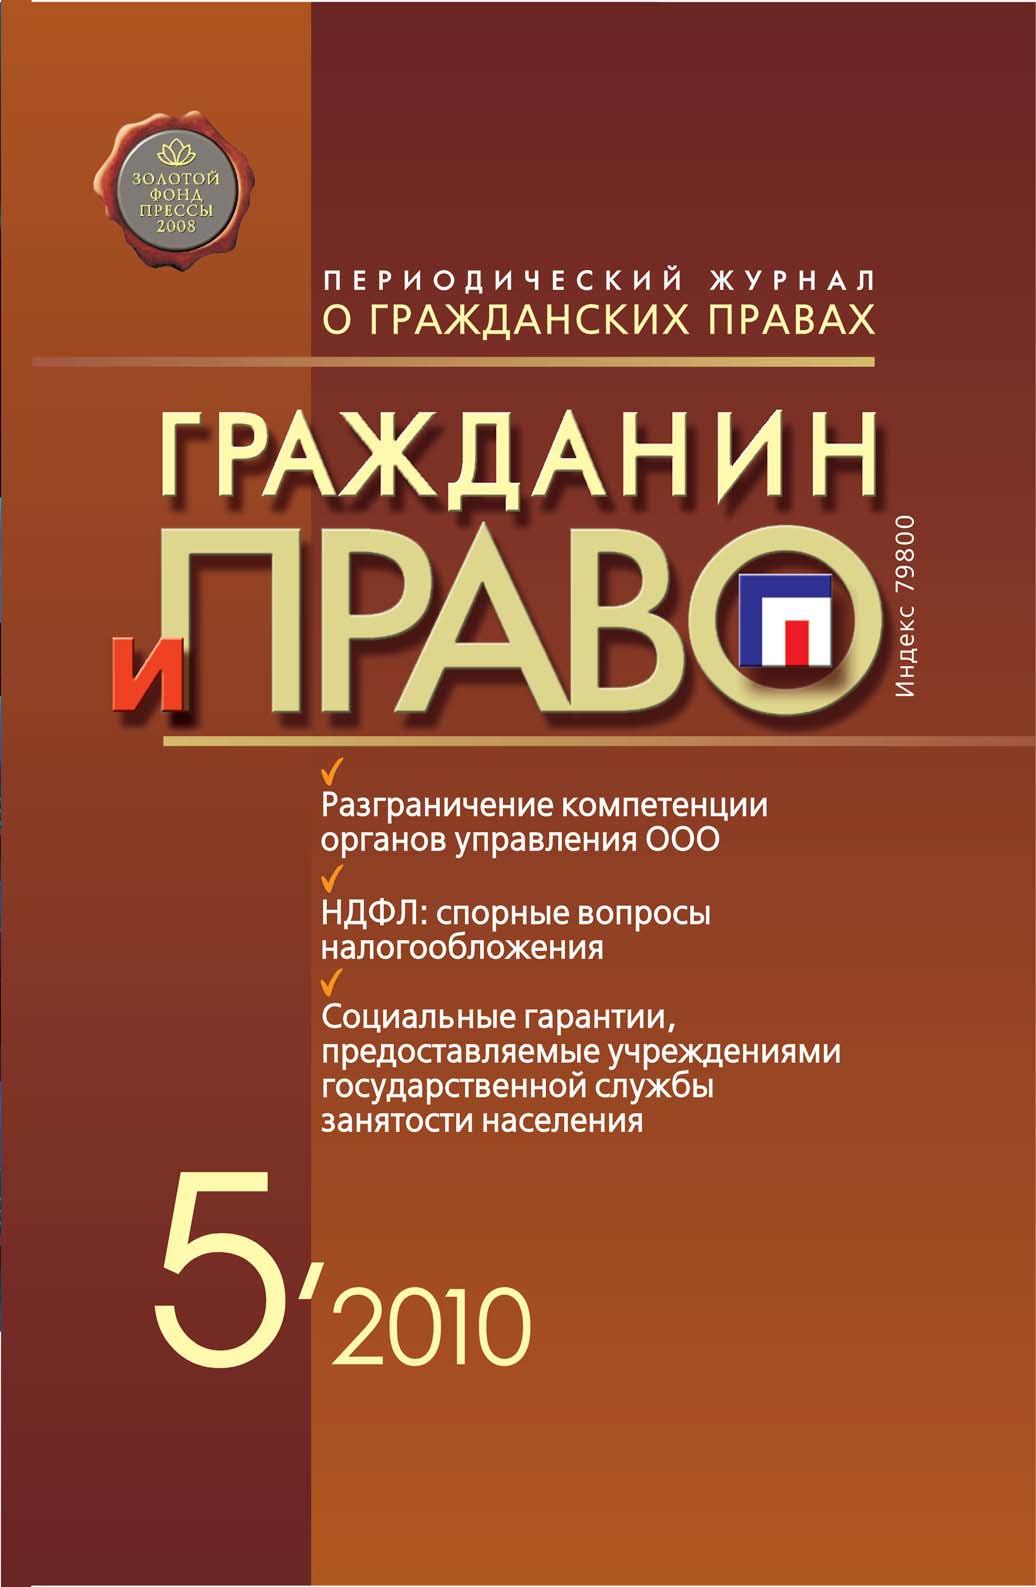 Гражданин и право №05/2010